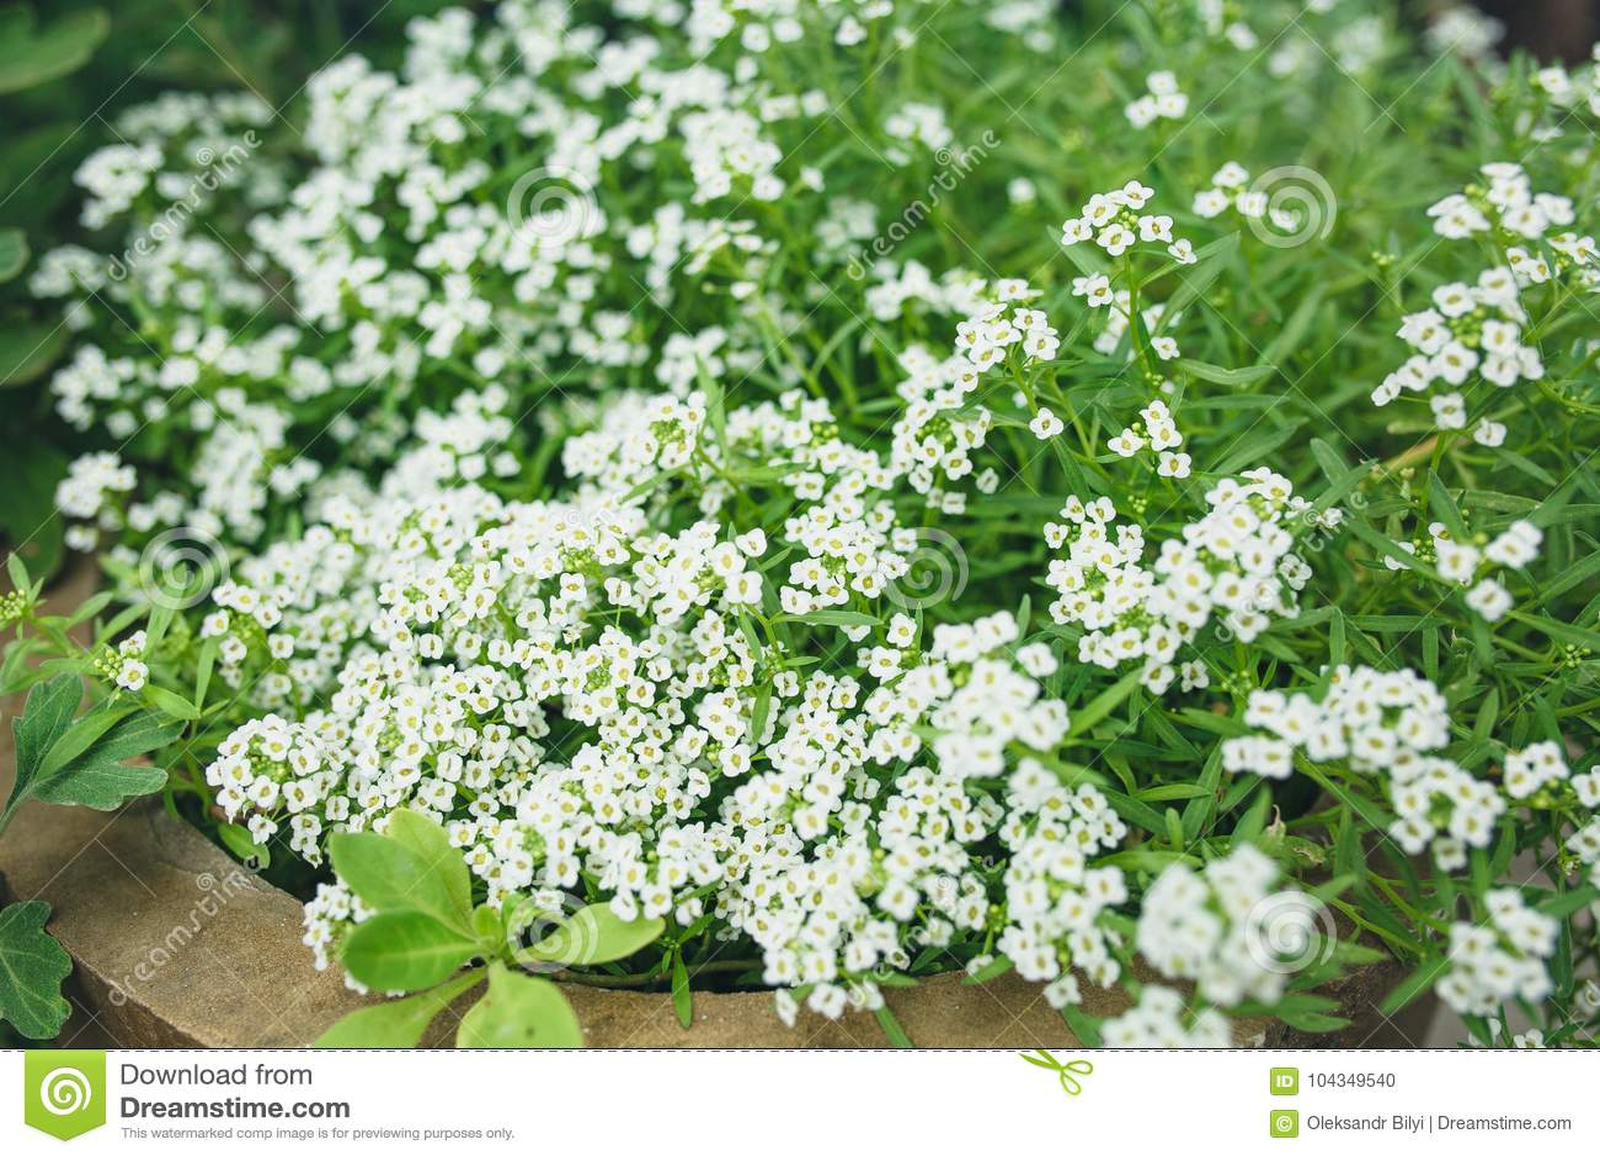 Tiny White Flowers Stock Photo Image Of Edging Green 104349540